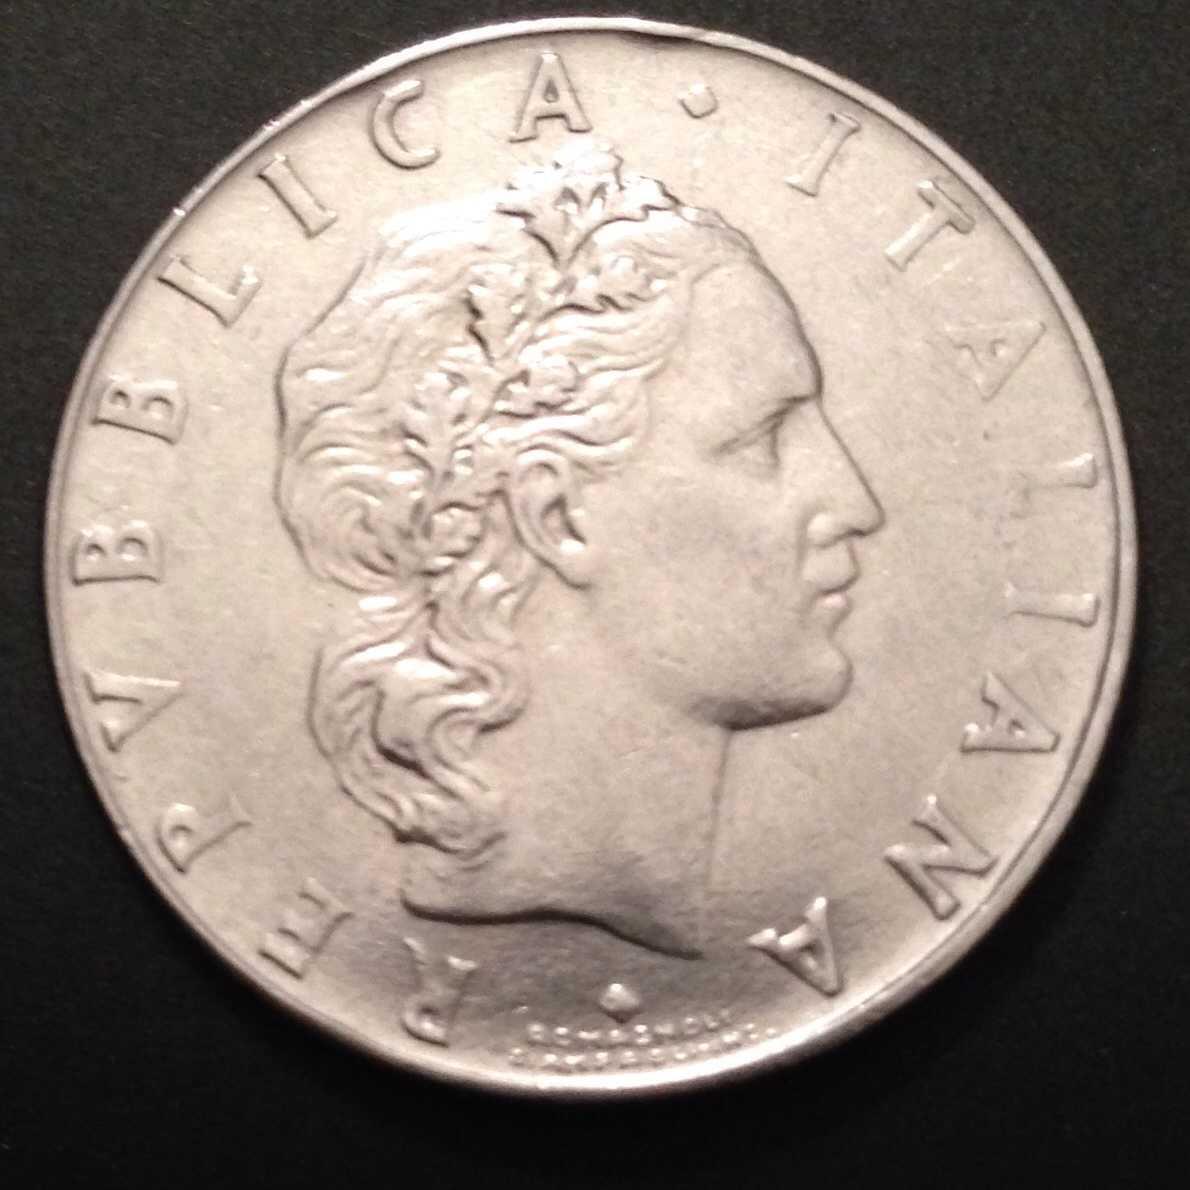 English To Italian Translator Google: 1963 50 Lire R Italian Coin